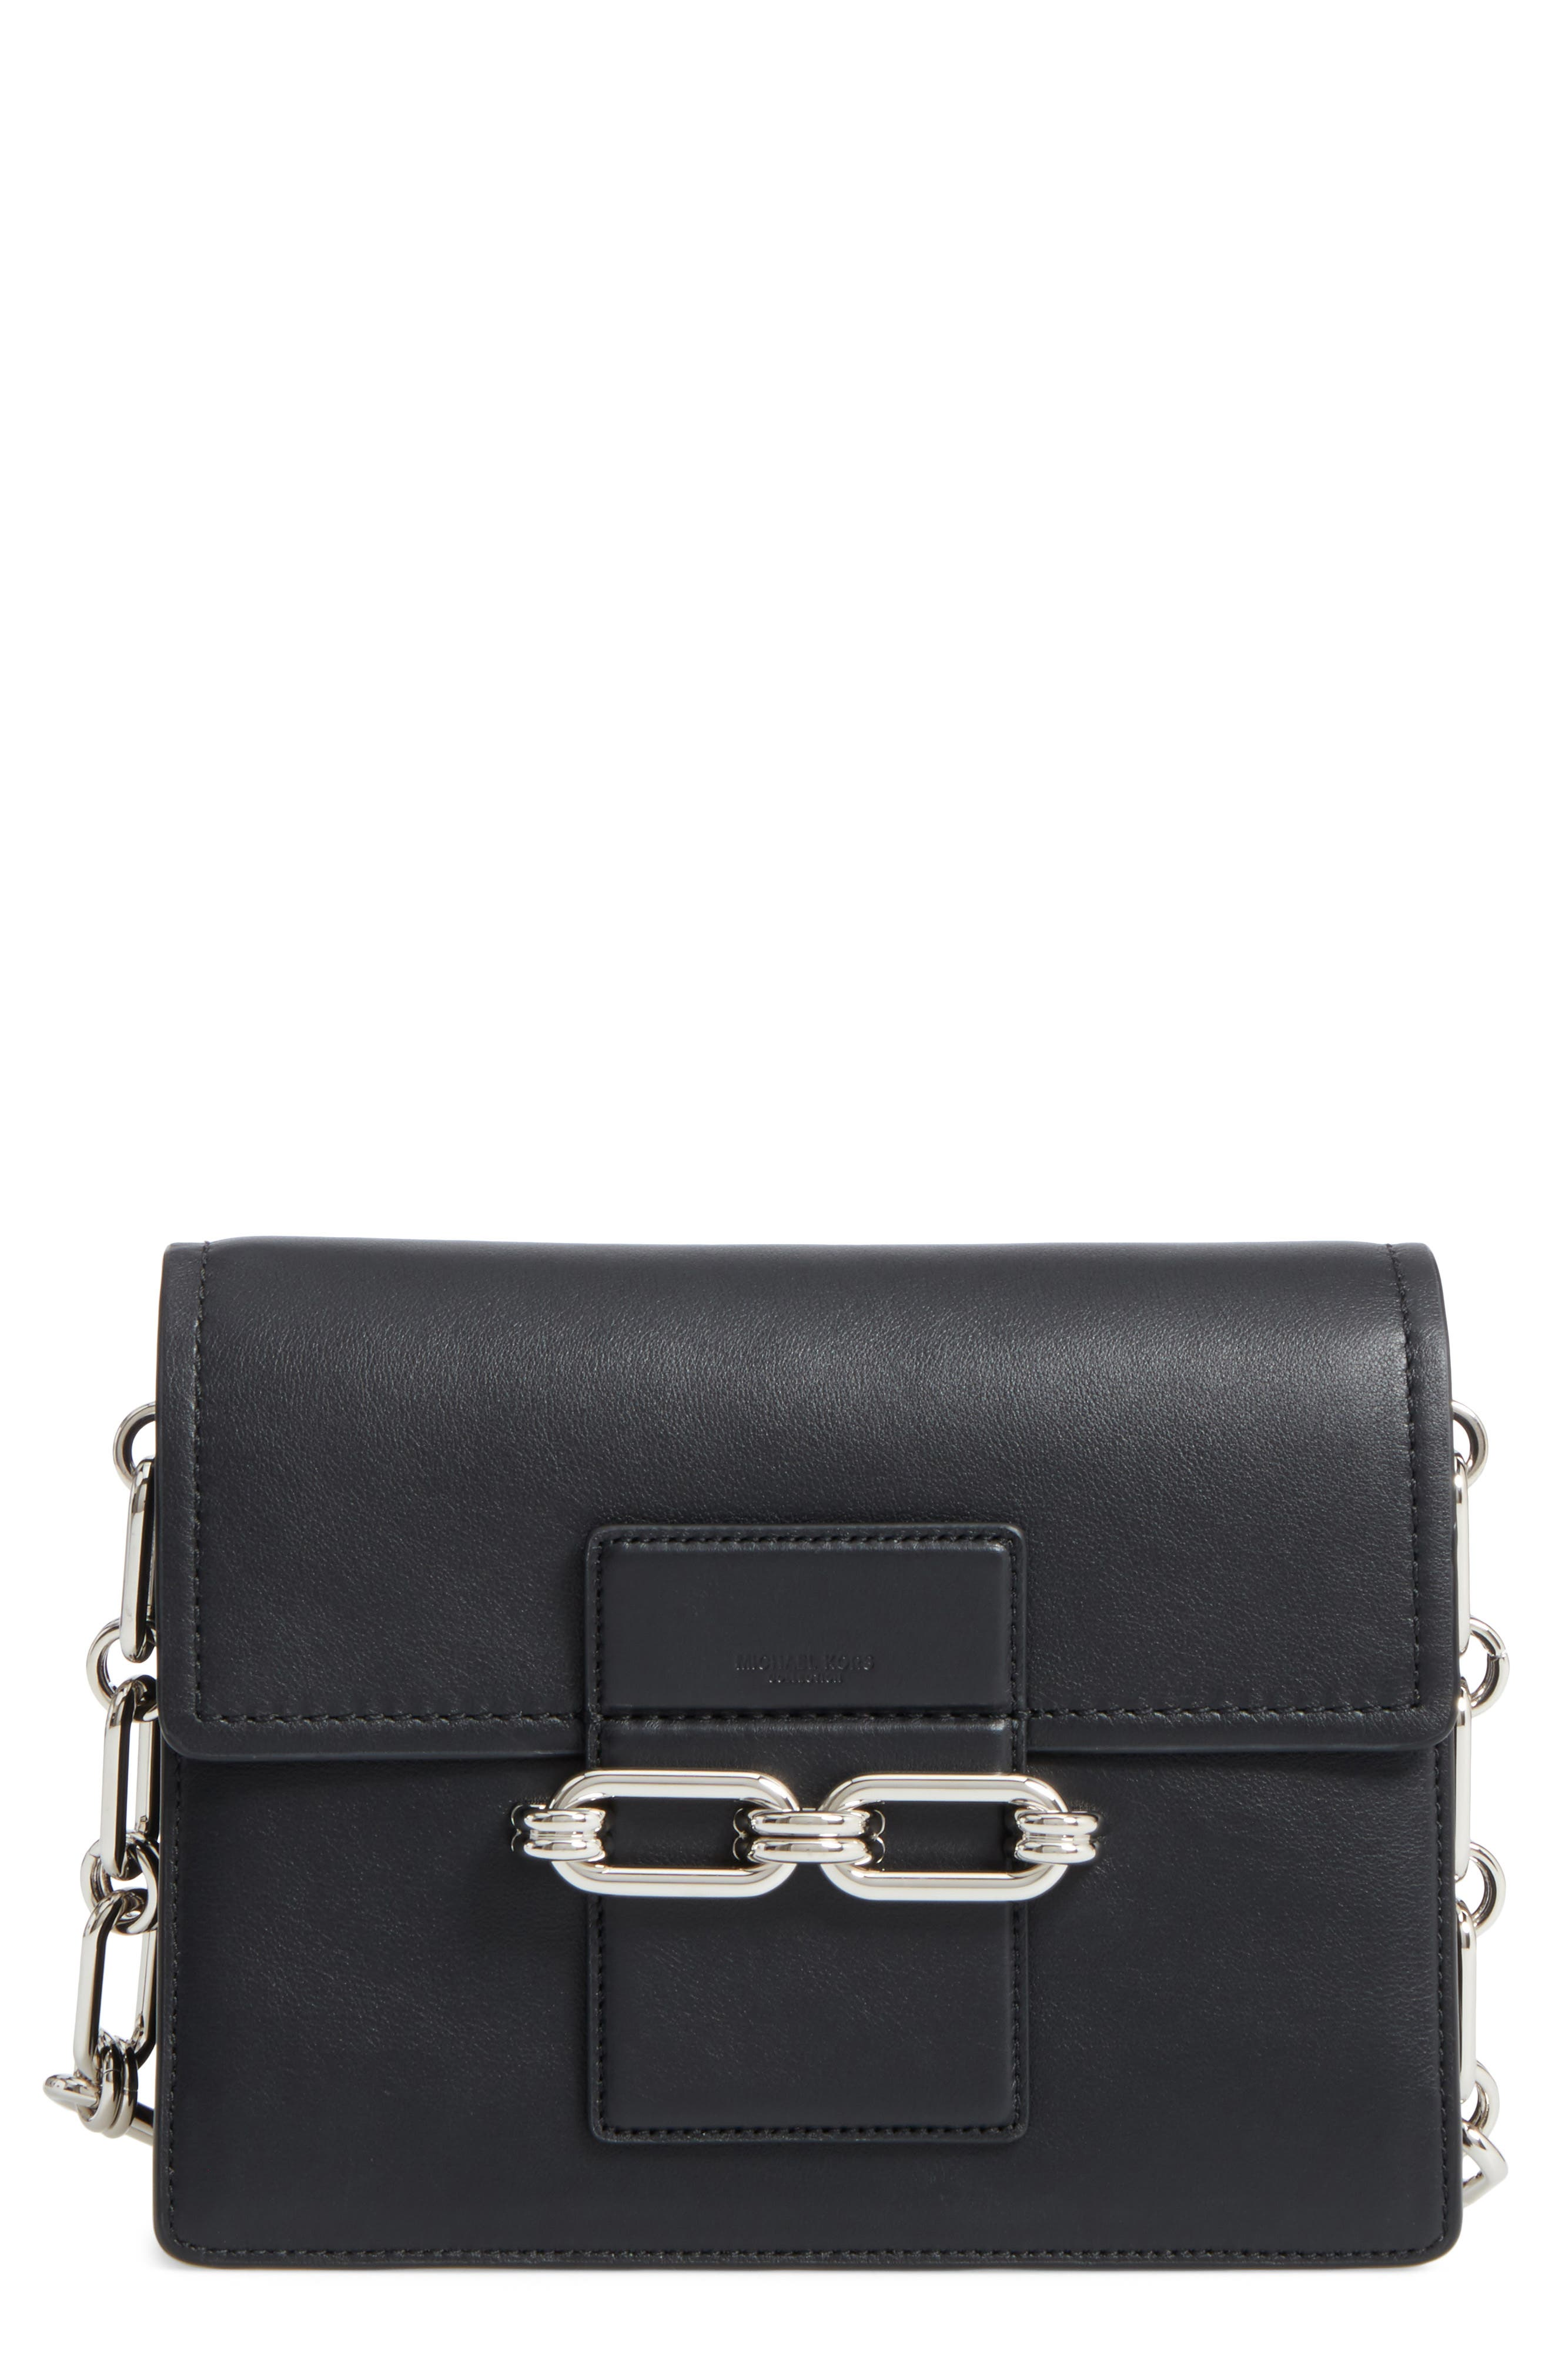 Medium Shoulder Bag,                             Main thumbnail 1, color,                             001